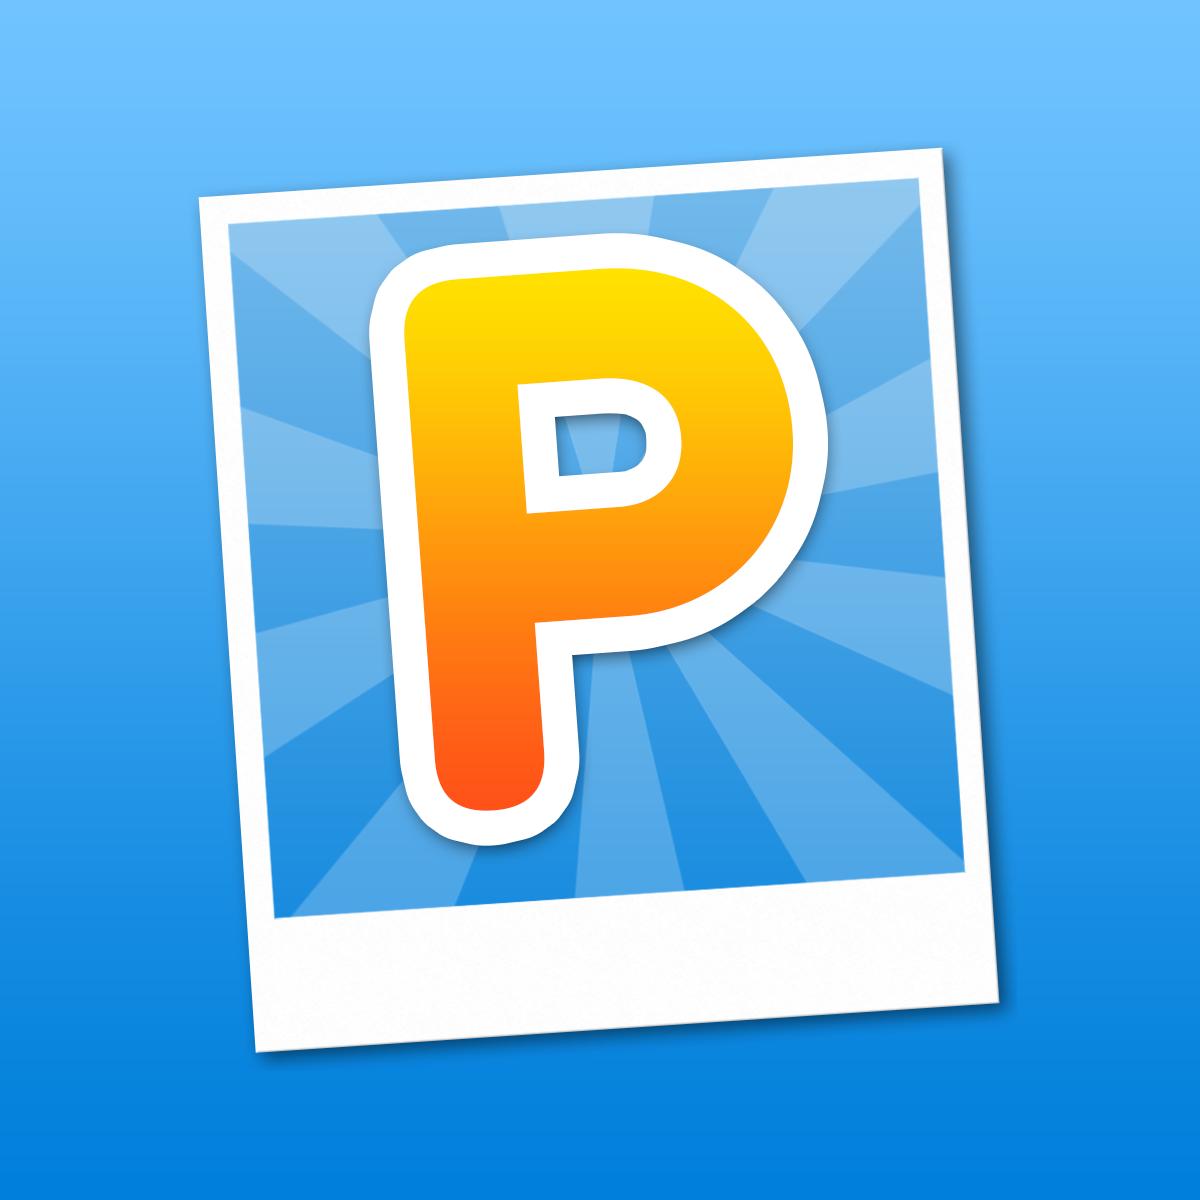 #Merry Christmas #Happy New Year